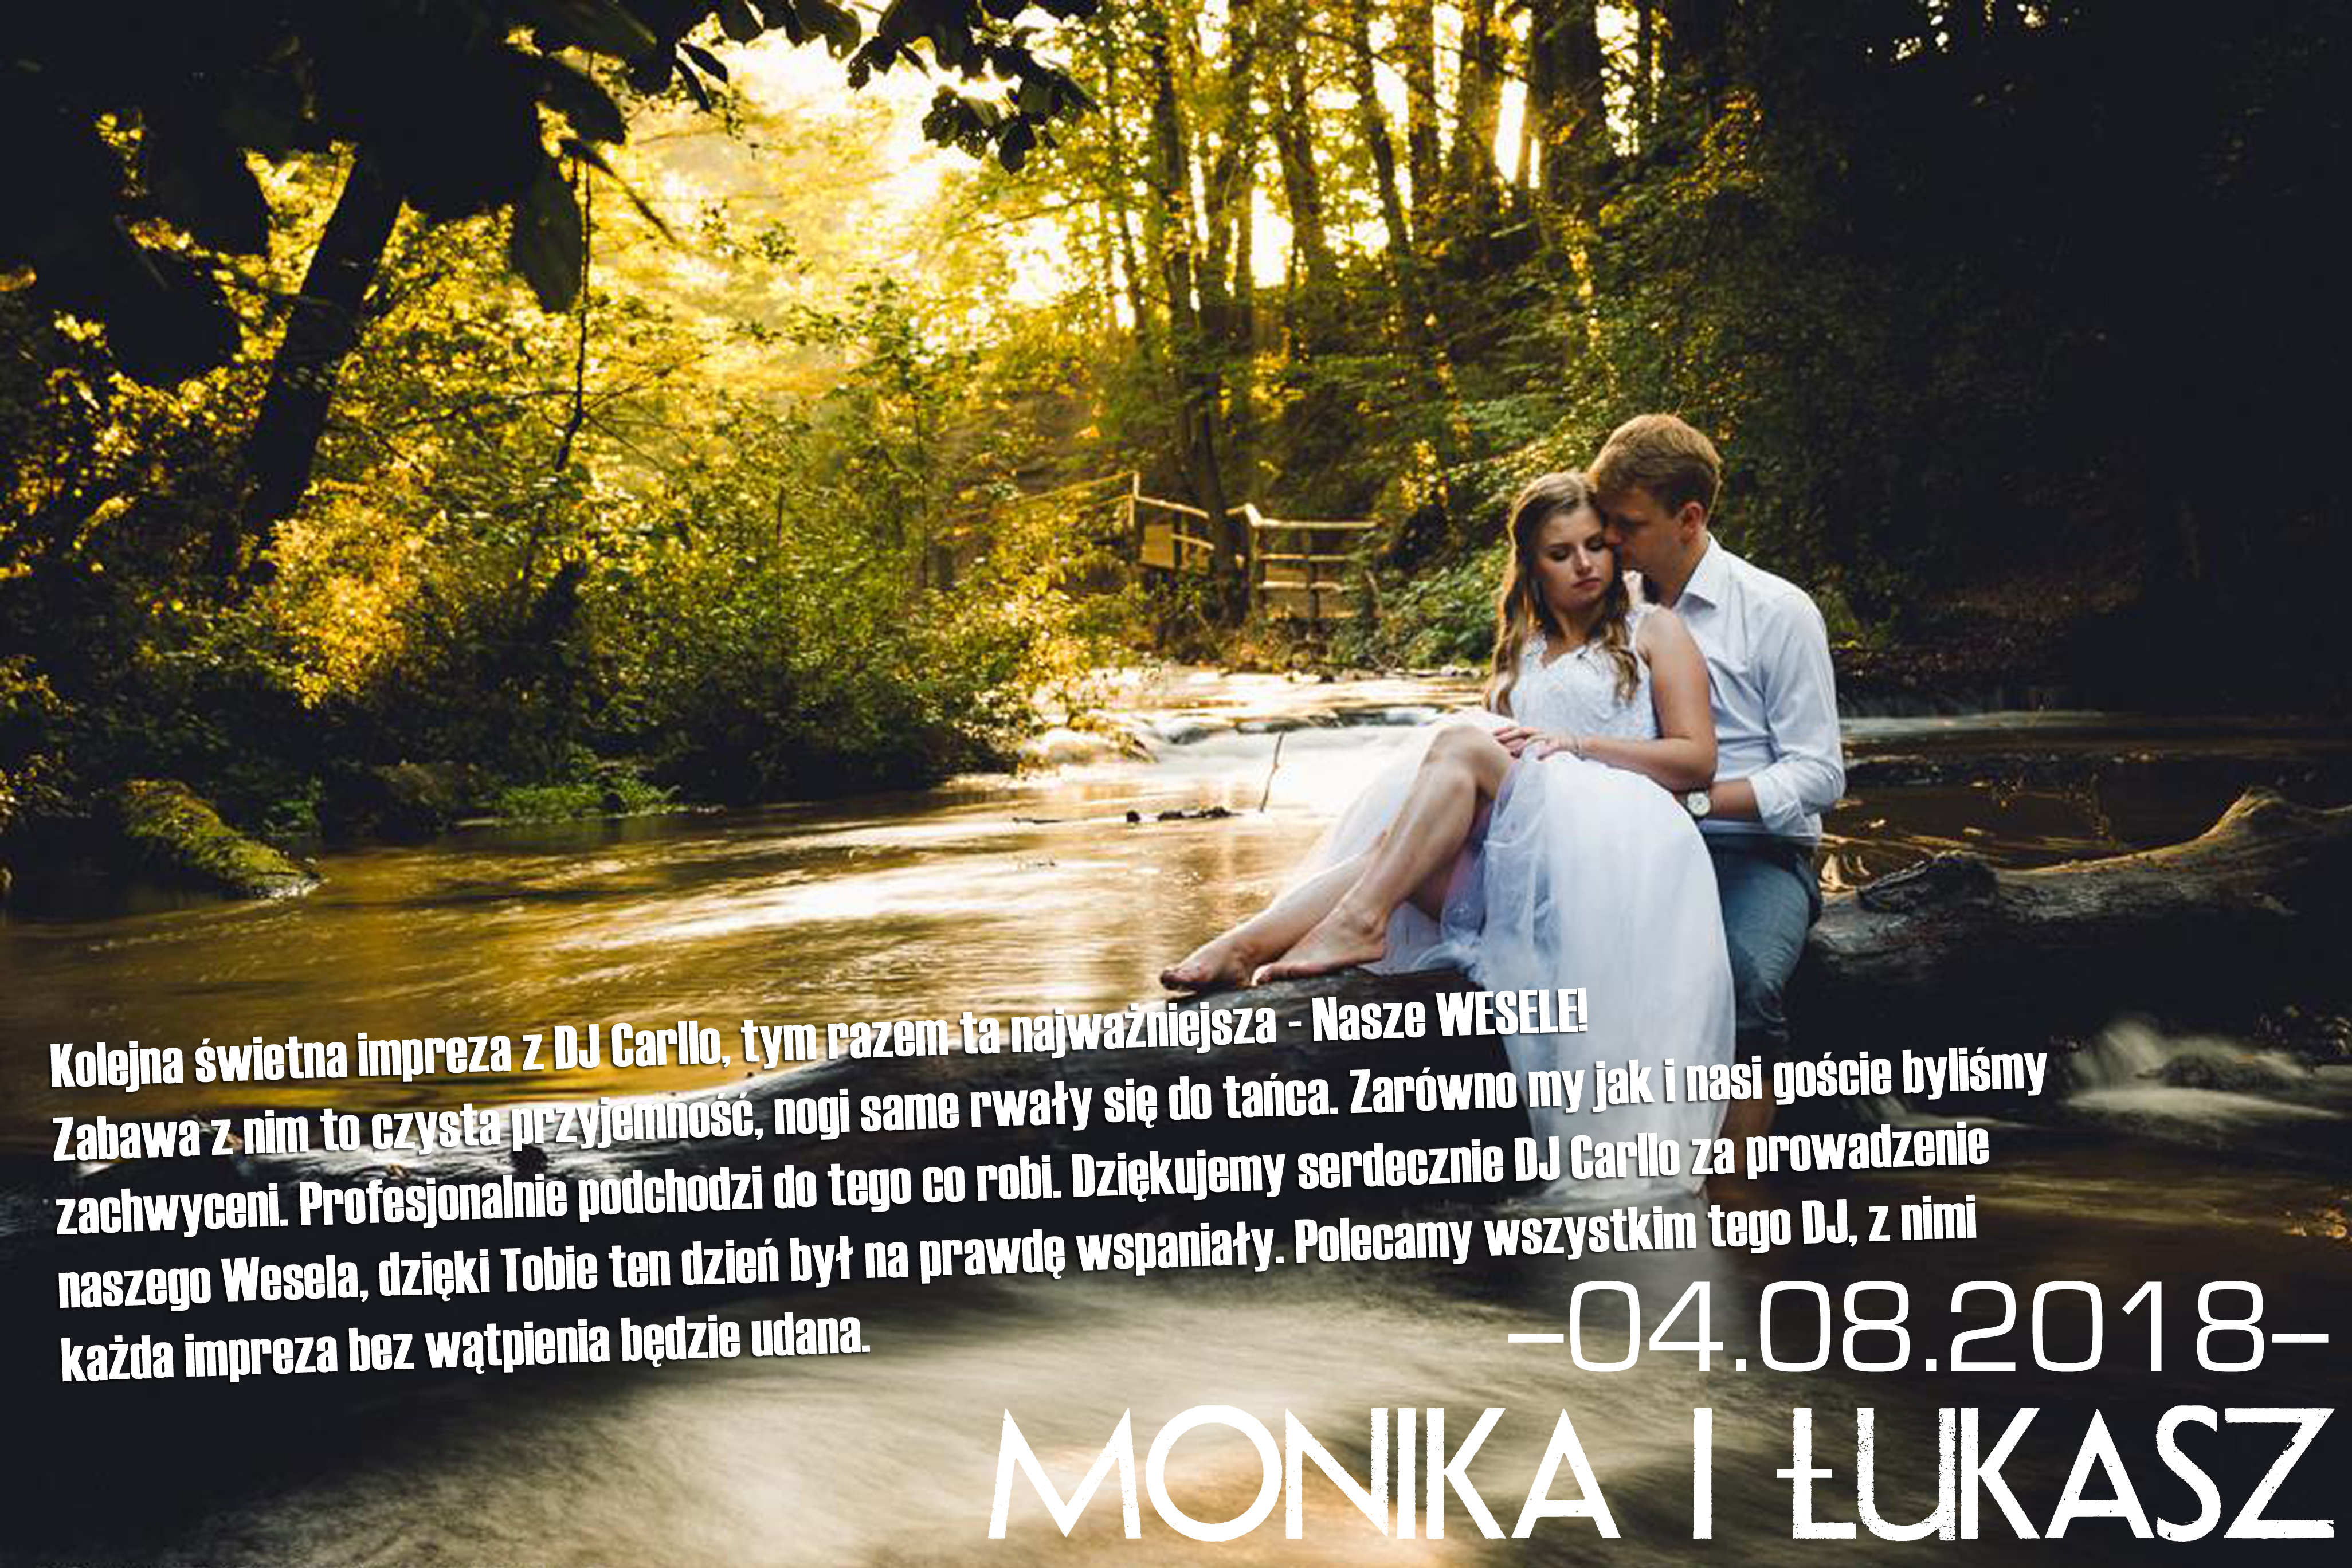 MONIKA & ŁUKASZ